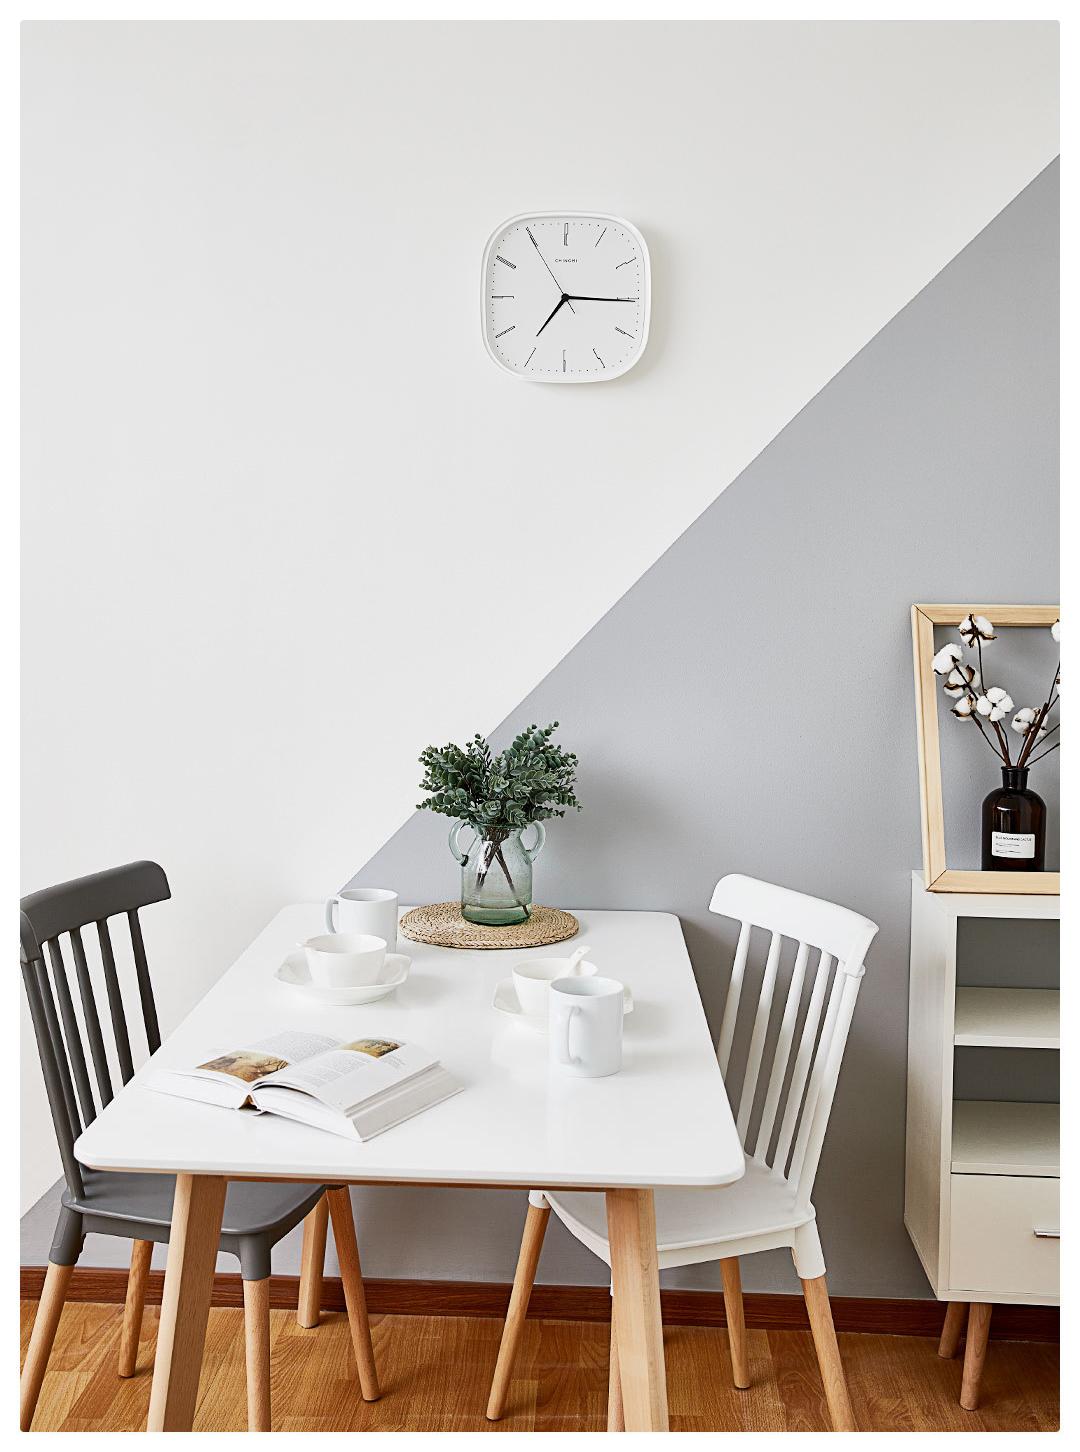 Xiaomi Mijia Chingmi Wall Clock Ultra Slient Precise Simple Design Style White Clock Home Decor